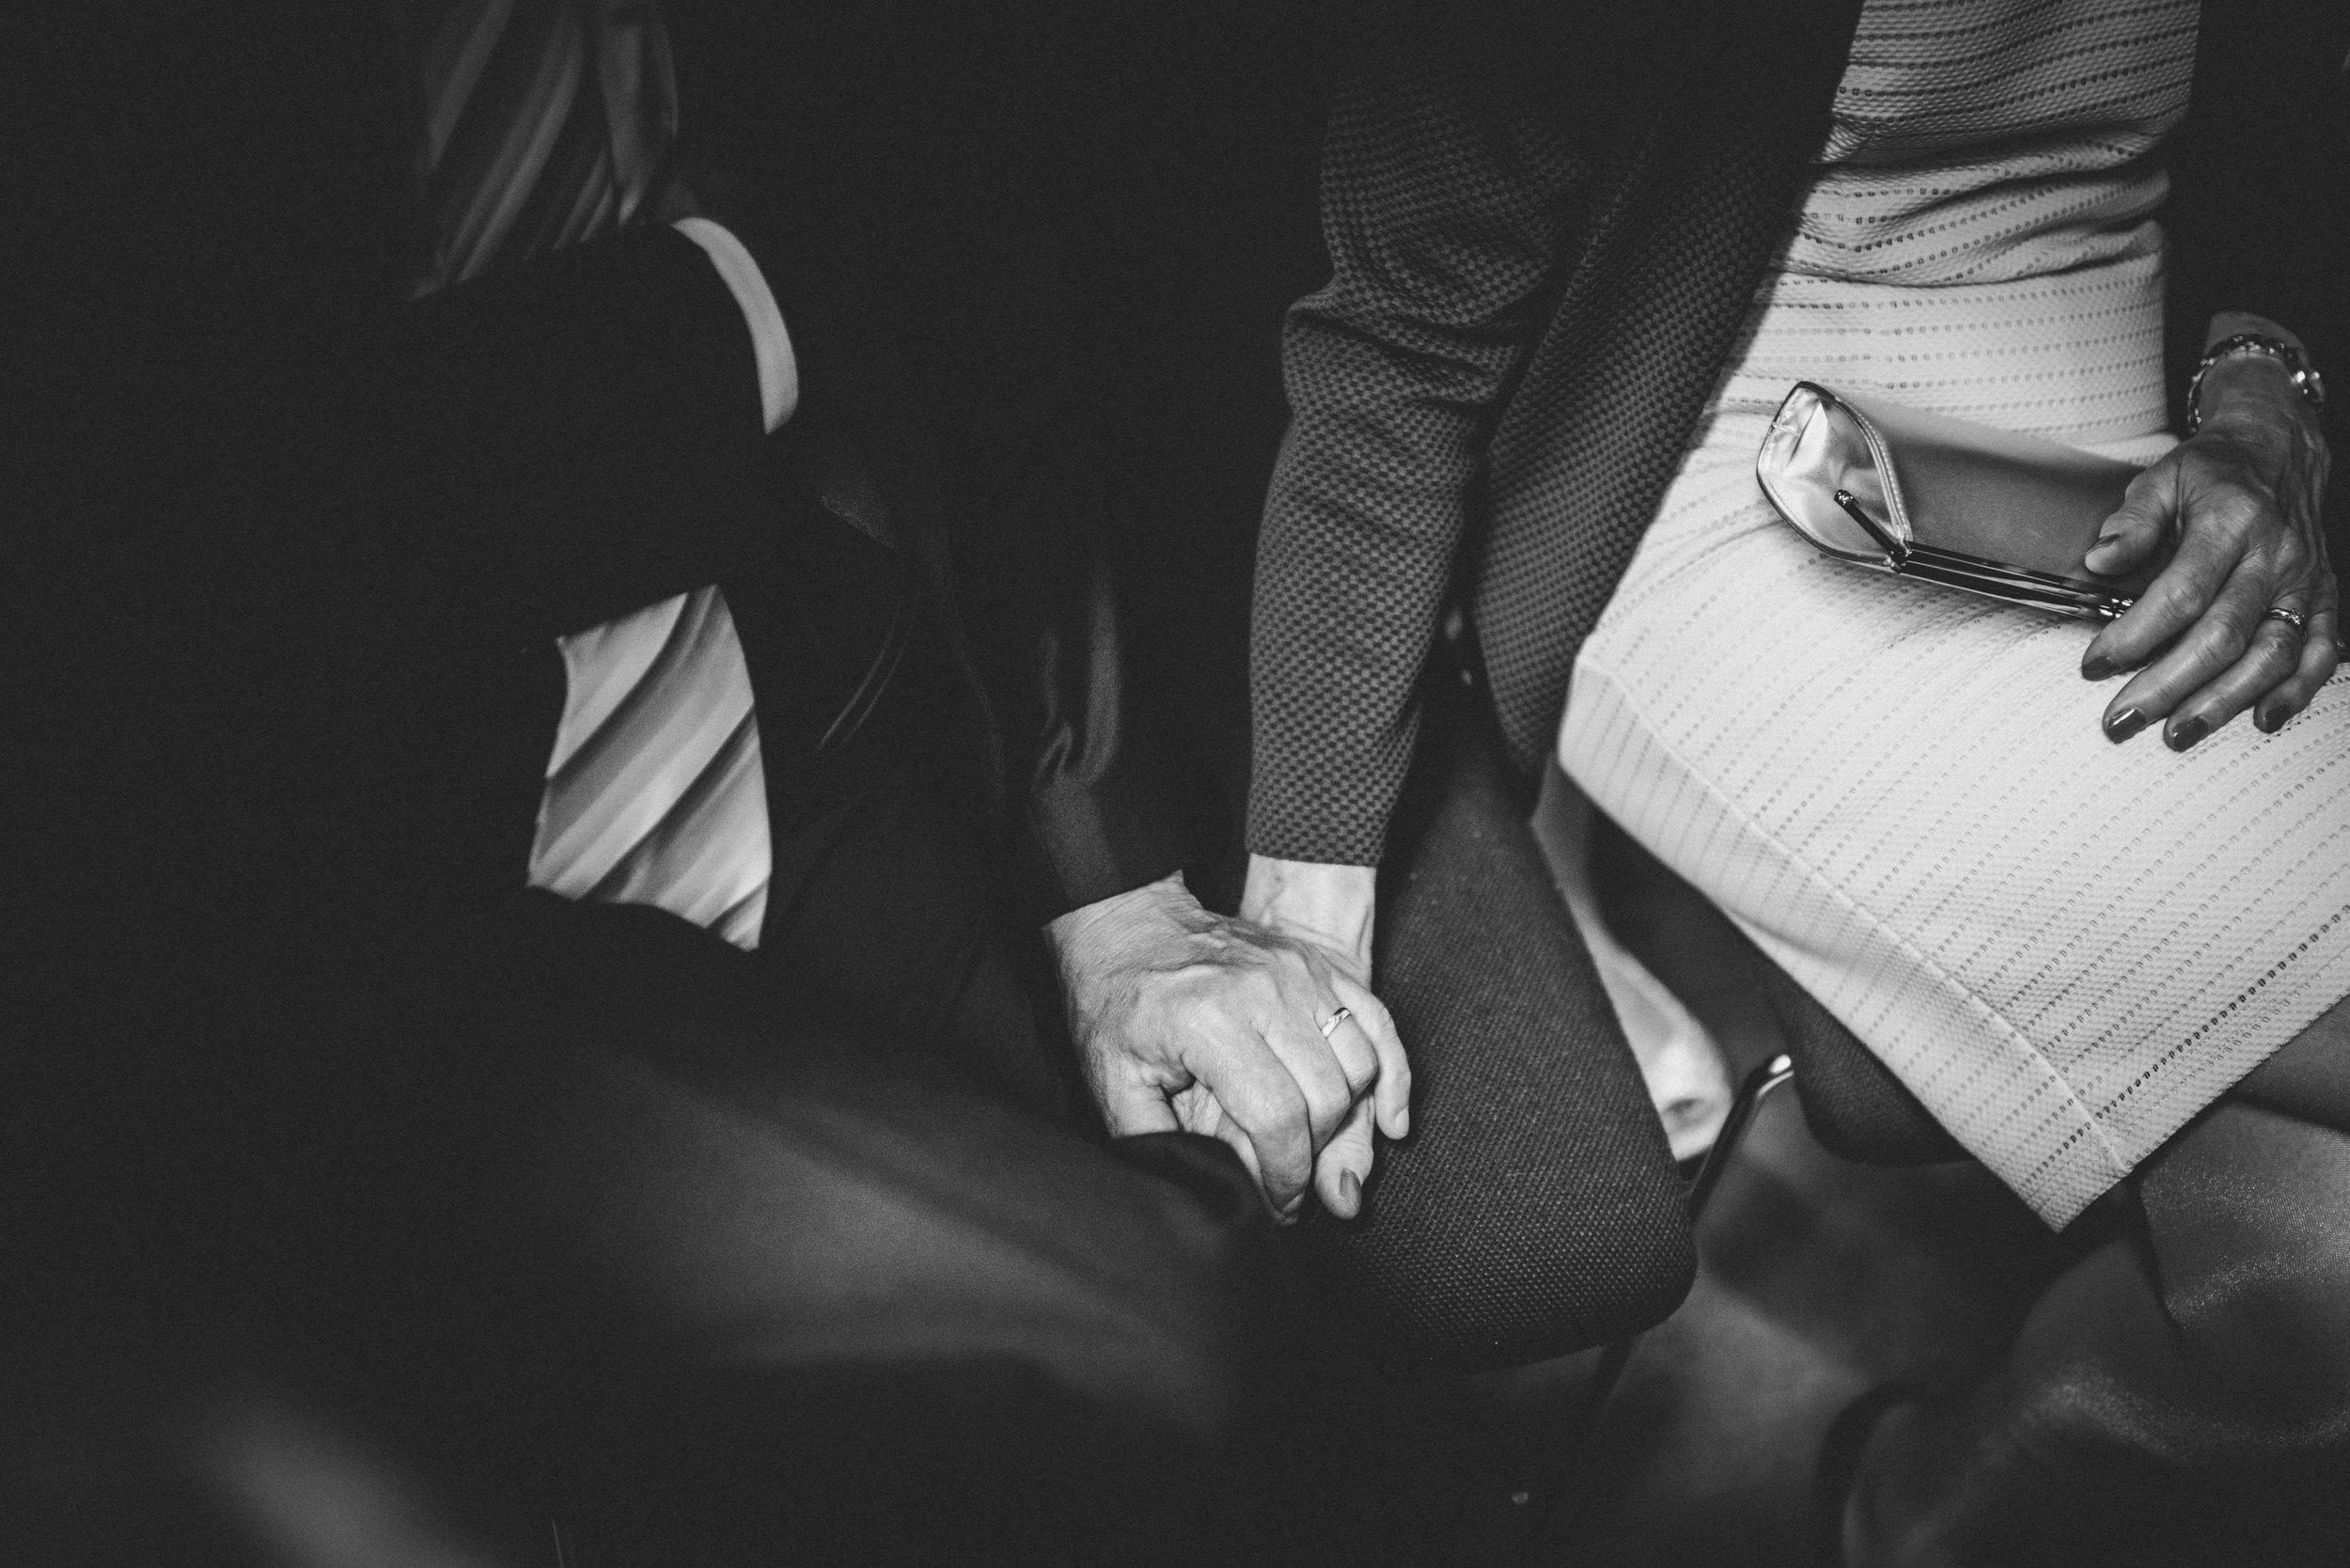 0121-LISA-DEVINE-PHOTOGRAPHY-ALTERNATIVE-WEDDING-PHOTOGRAPHY-SCOTLAND-DESTINATION-WEDDINGS-GLASGOW-WEDDINGS-COOL-WEDDINGS-STYLISH-WEDDINGS.JPG